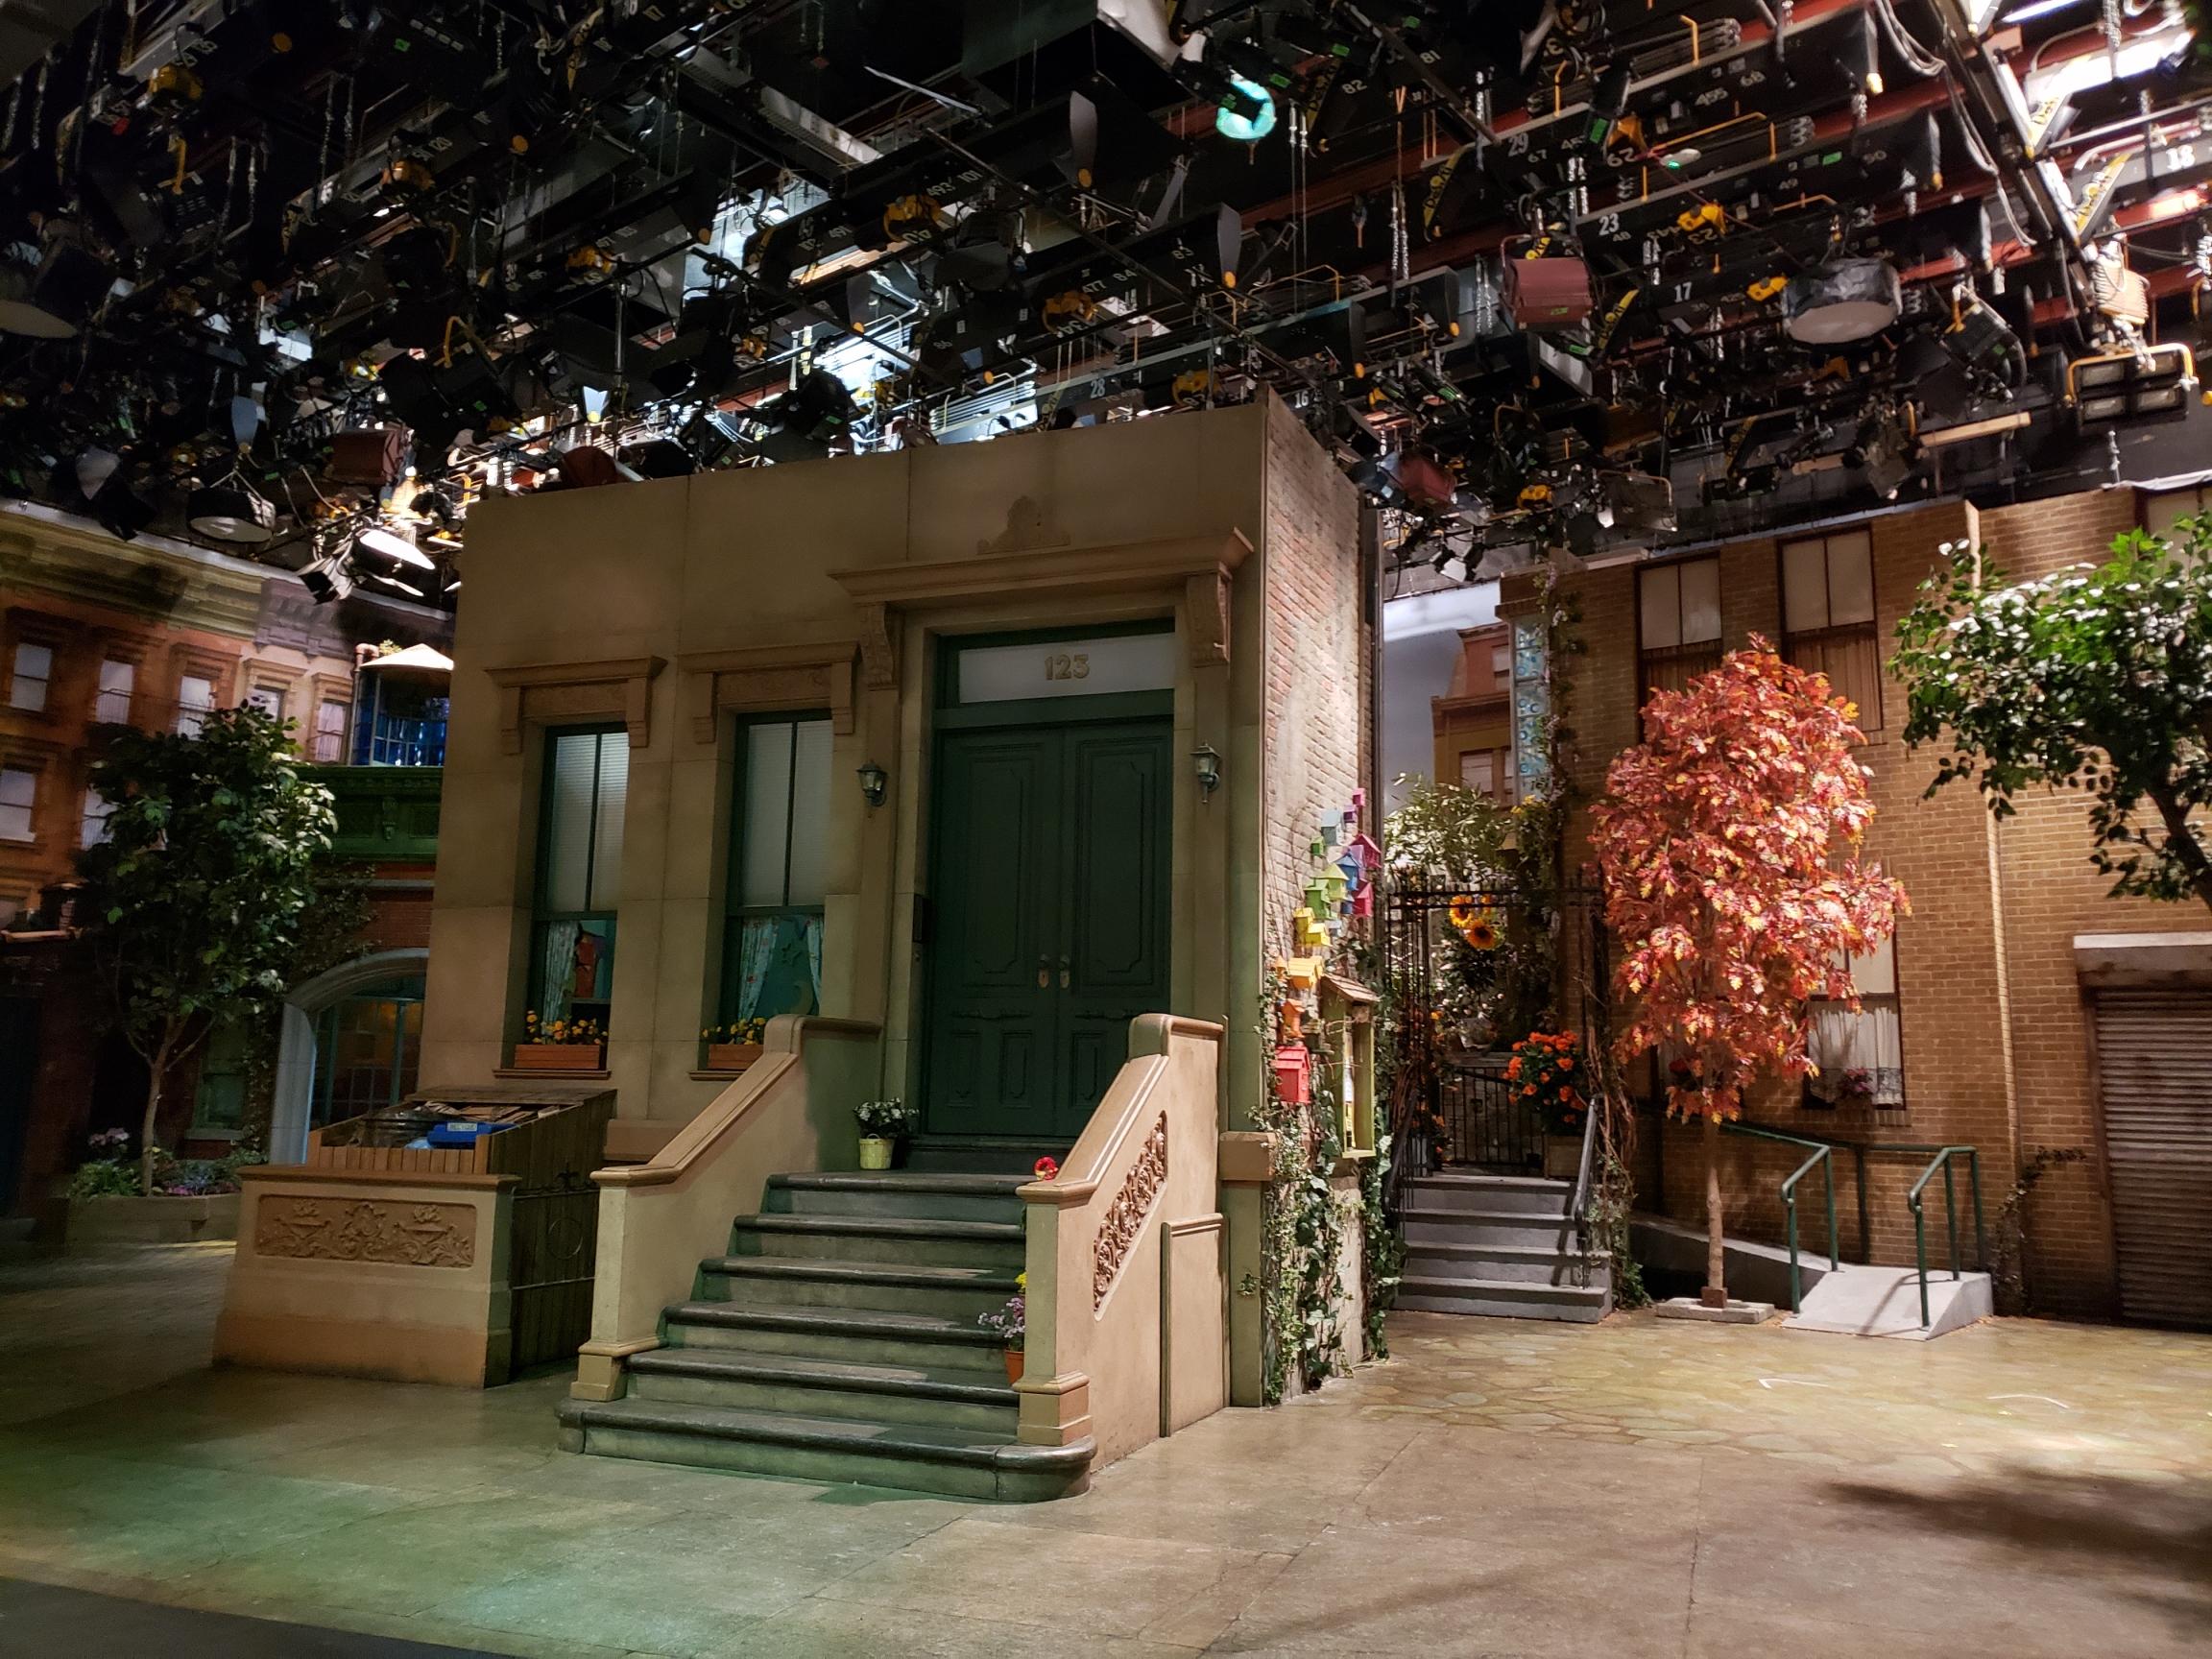 123 Sesame Street in Stage J at Kaufman Astoria Studios.